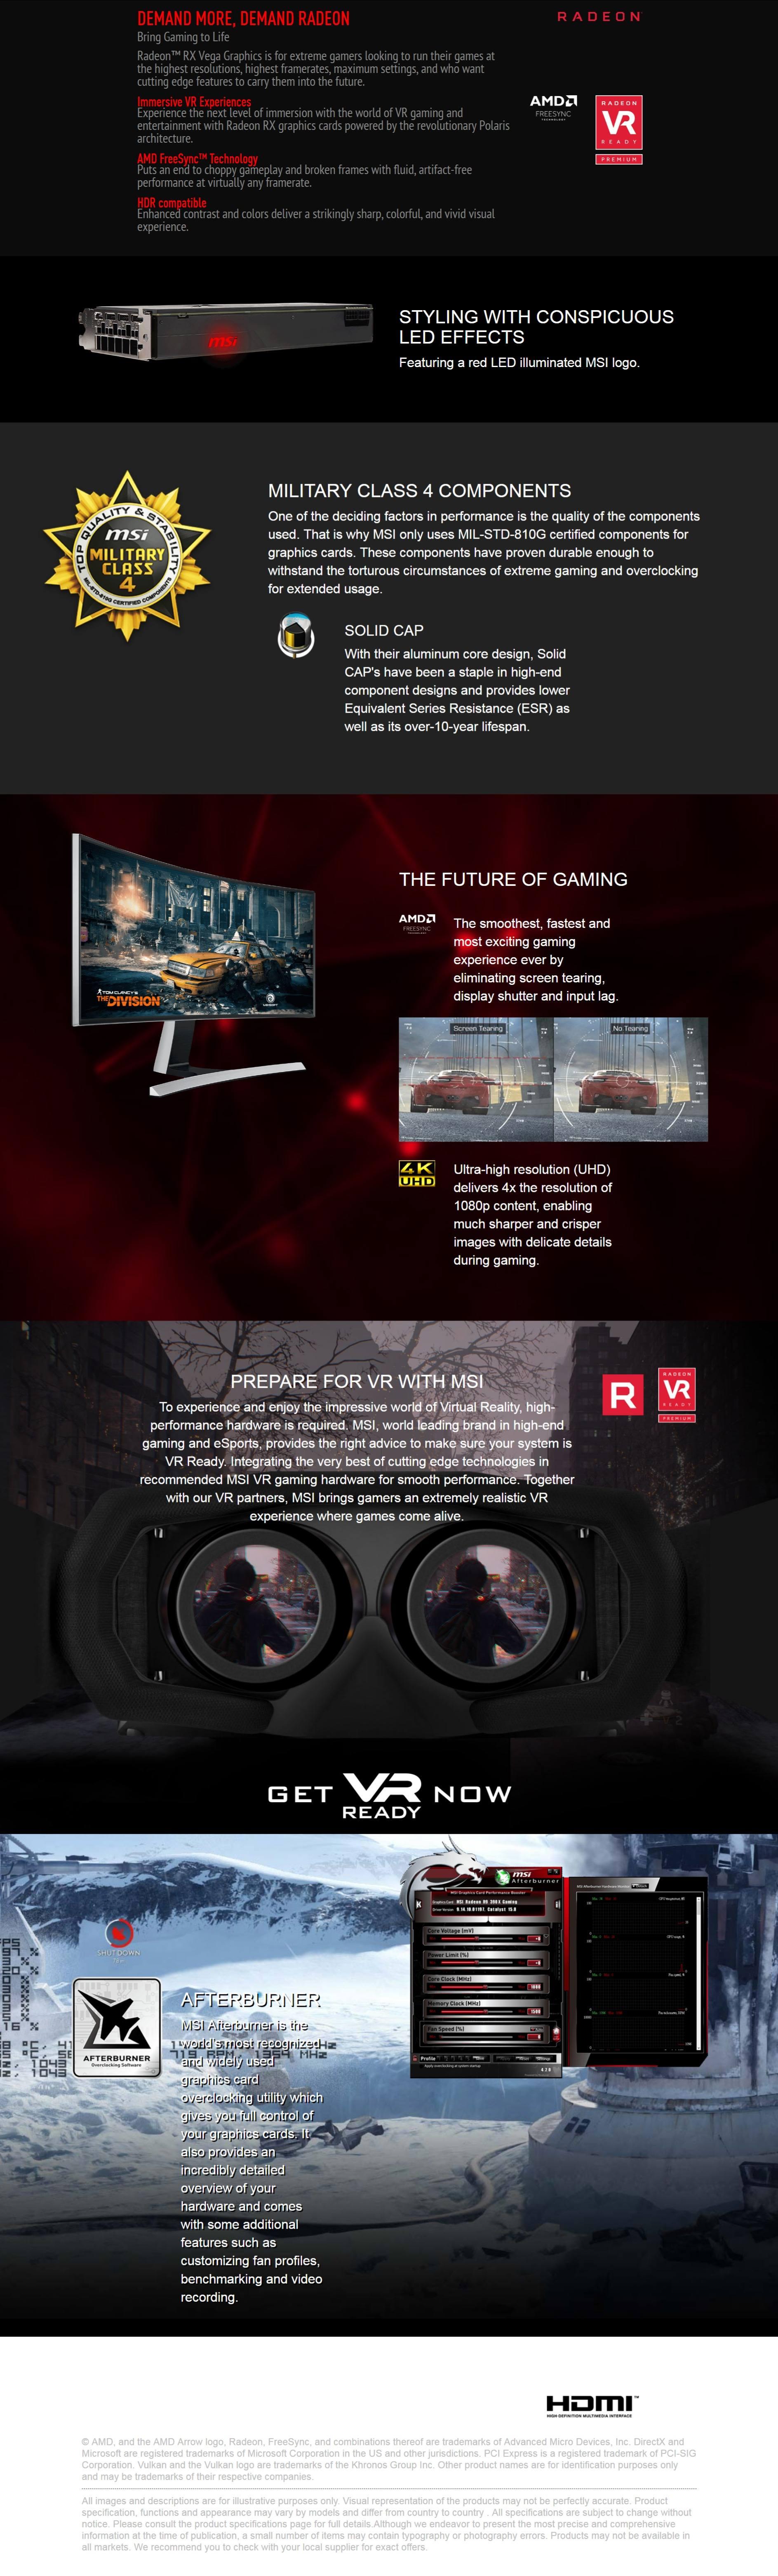 MSI Radeon RX VEGA 64 Air Boost 8G OC Graphics Card